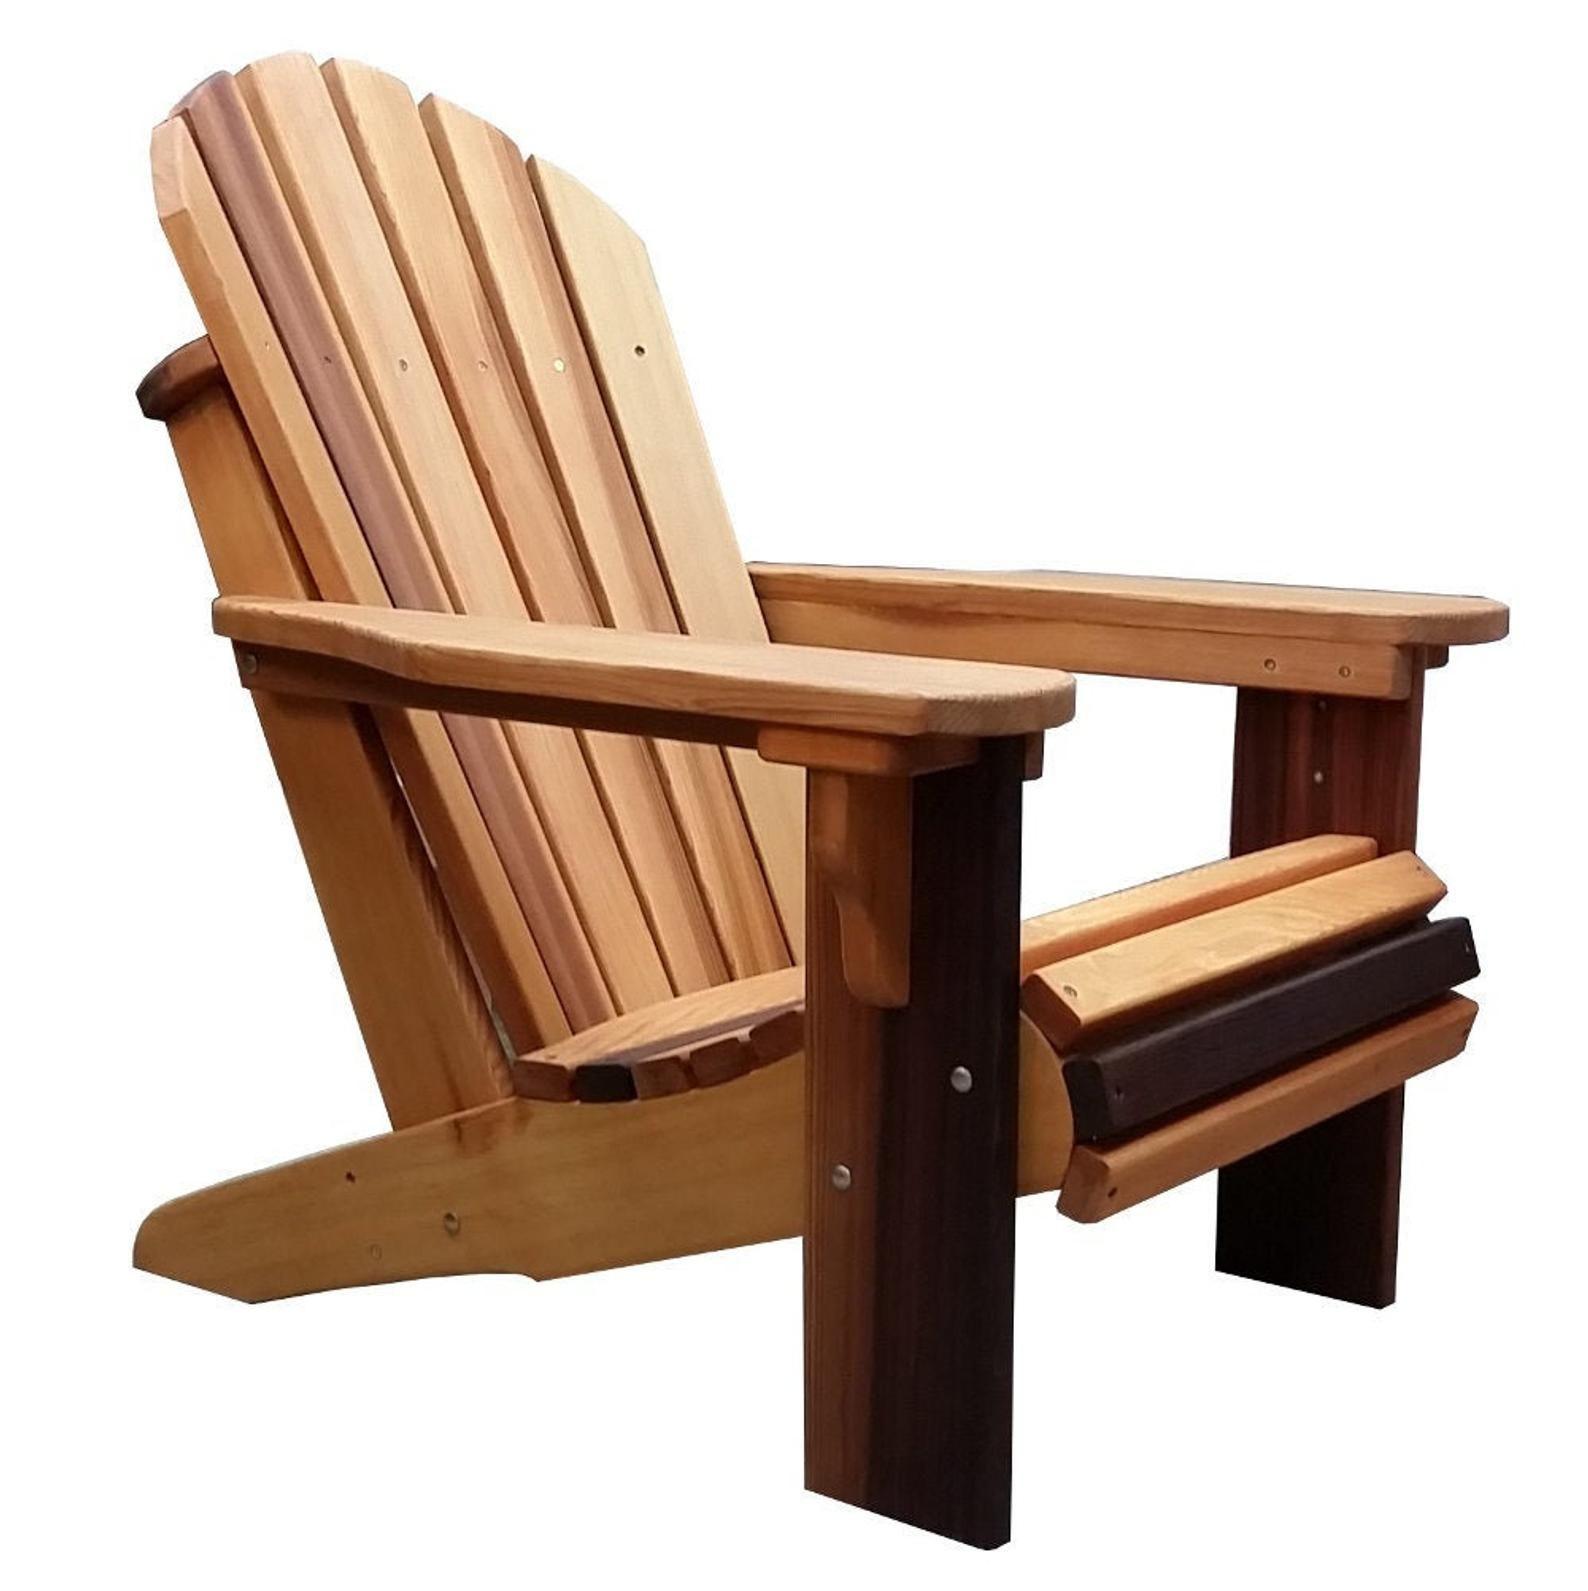 Premium Western Red Cedar Wood Adirondack Chair Wood Adirondack